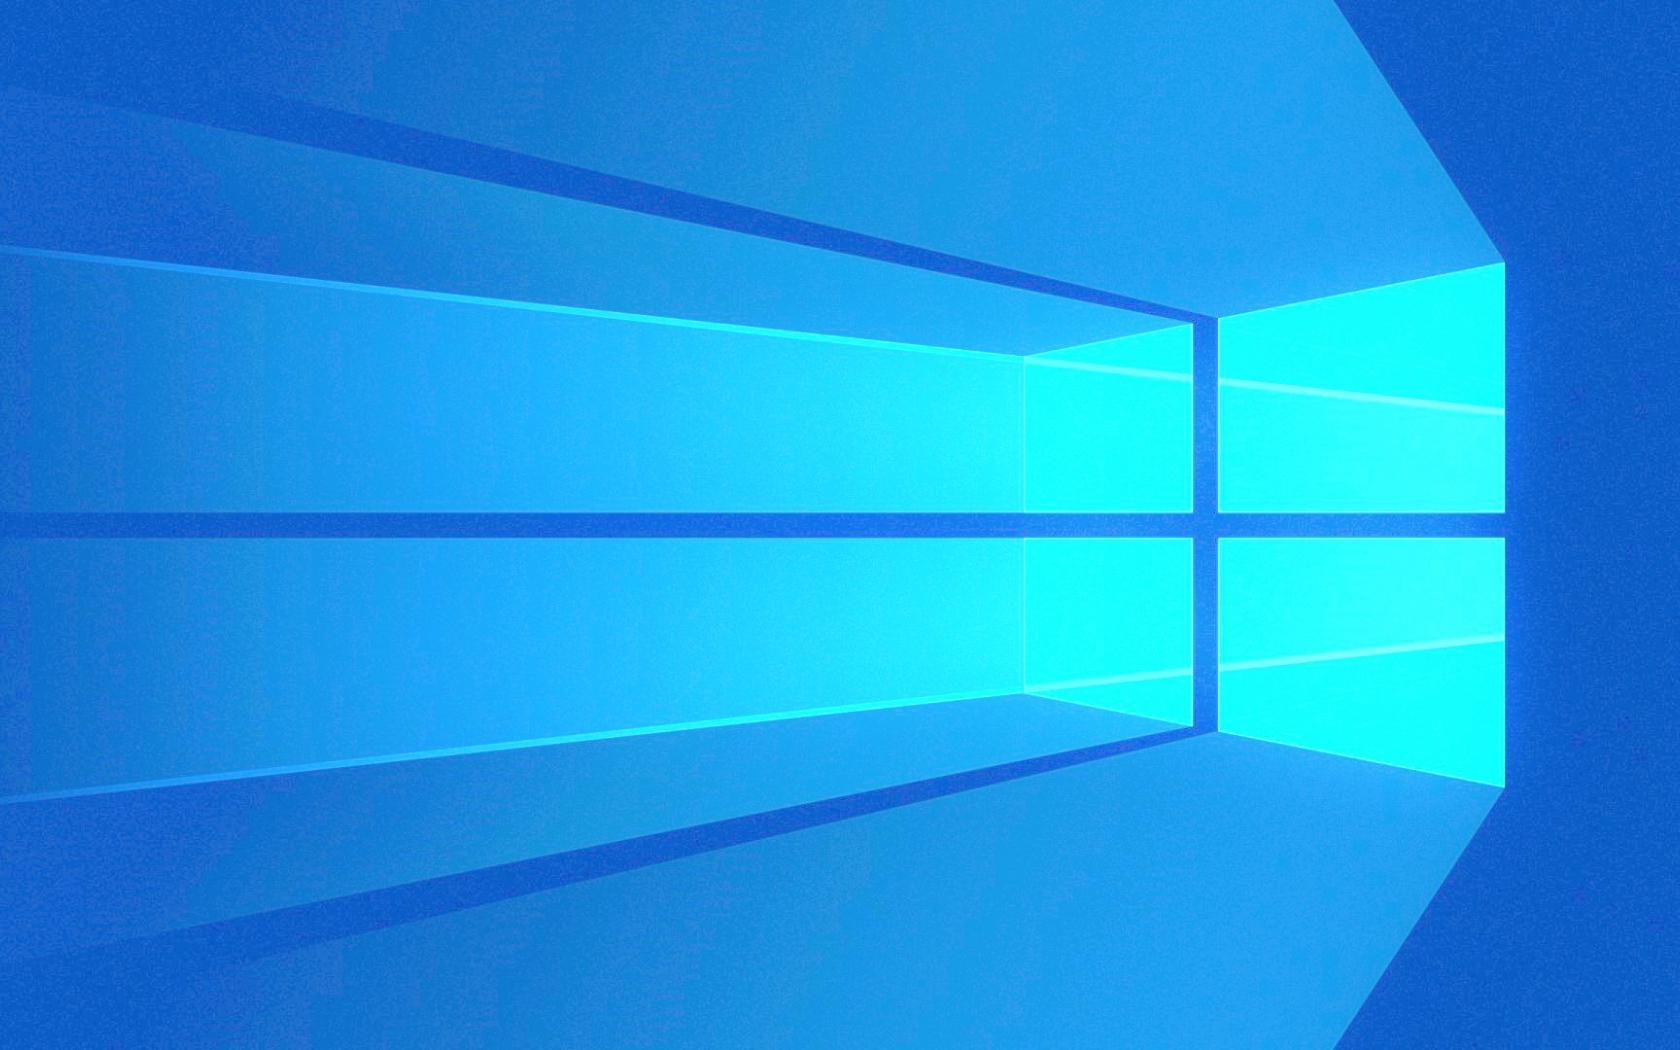 Free Download Redditpics 1920x1080 Windows 10 Wallpaper Bright